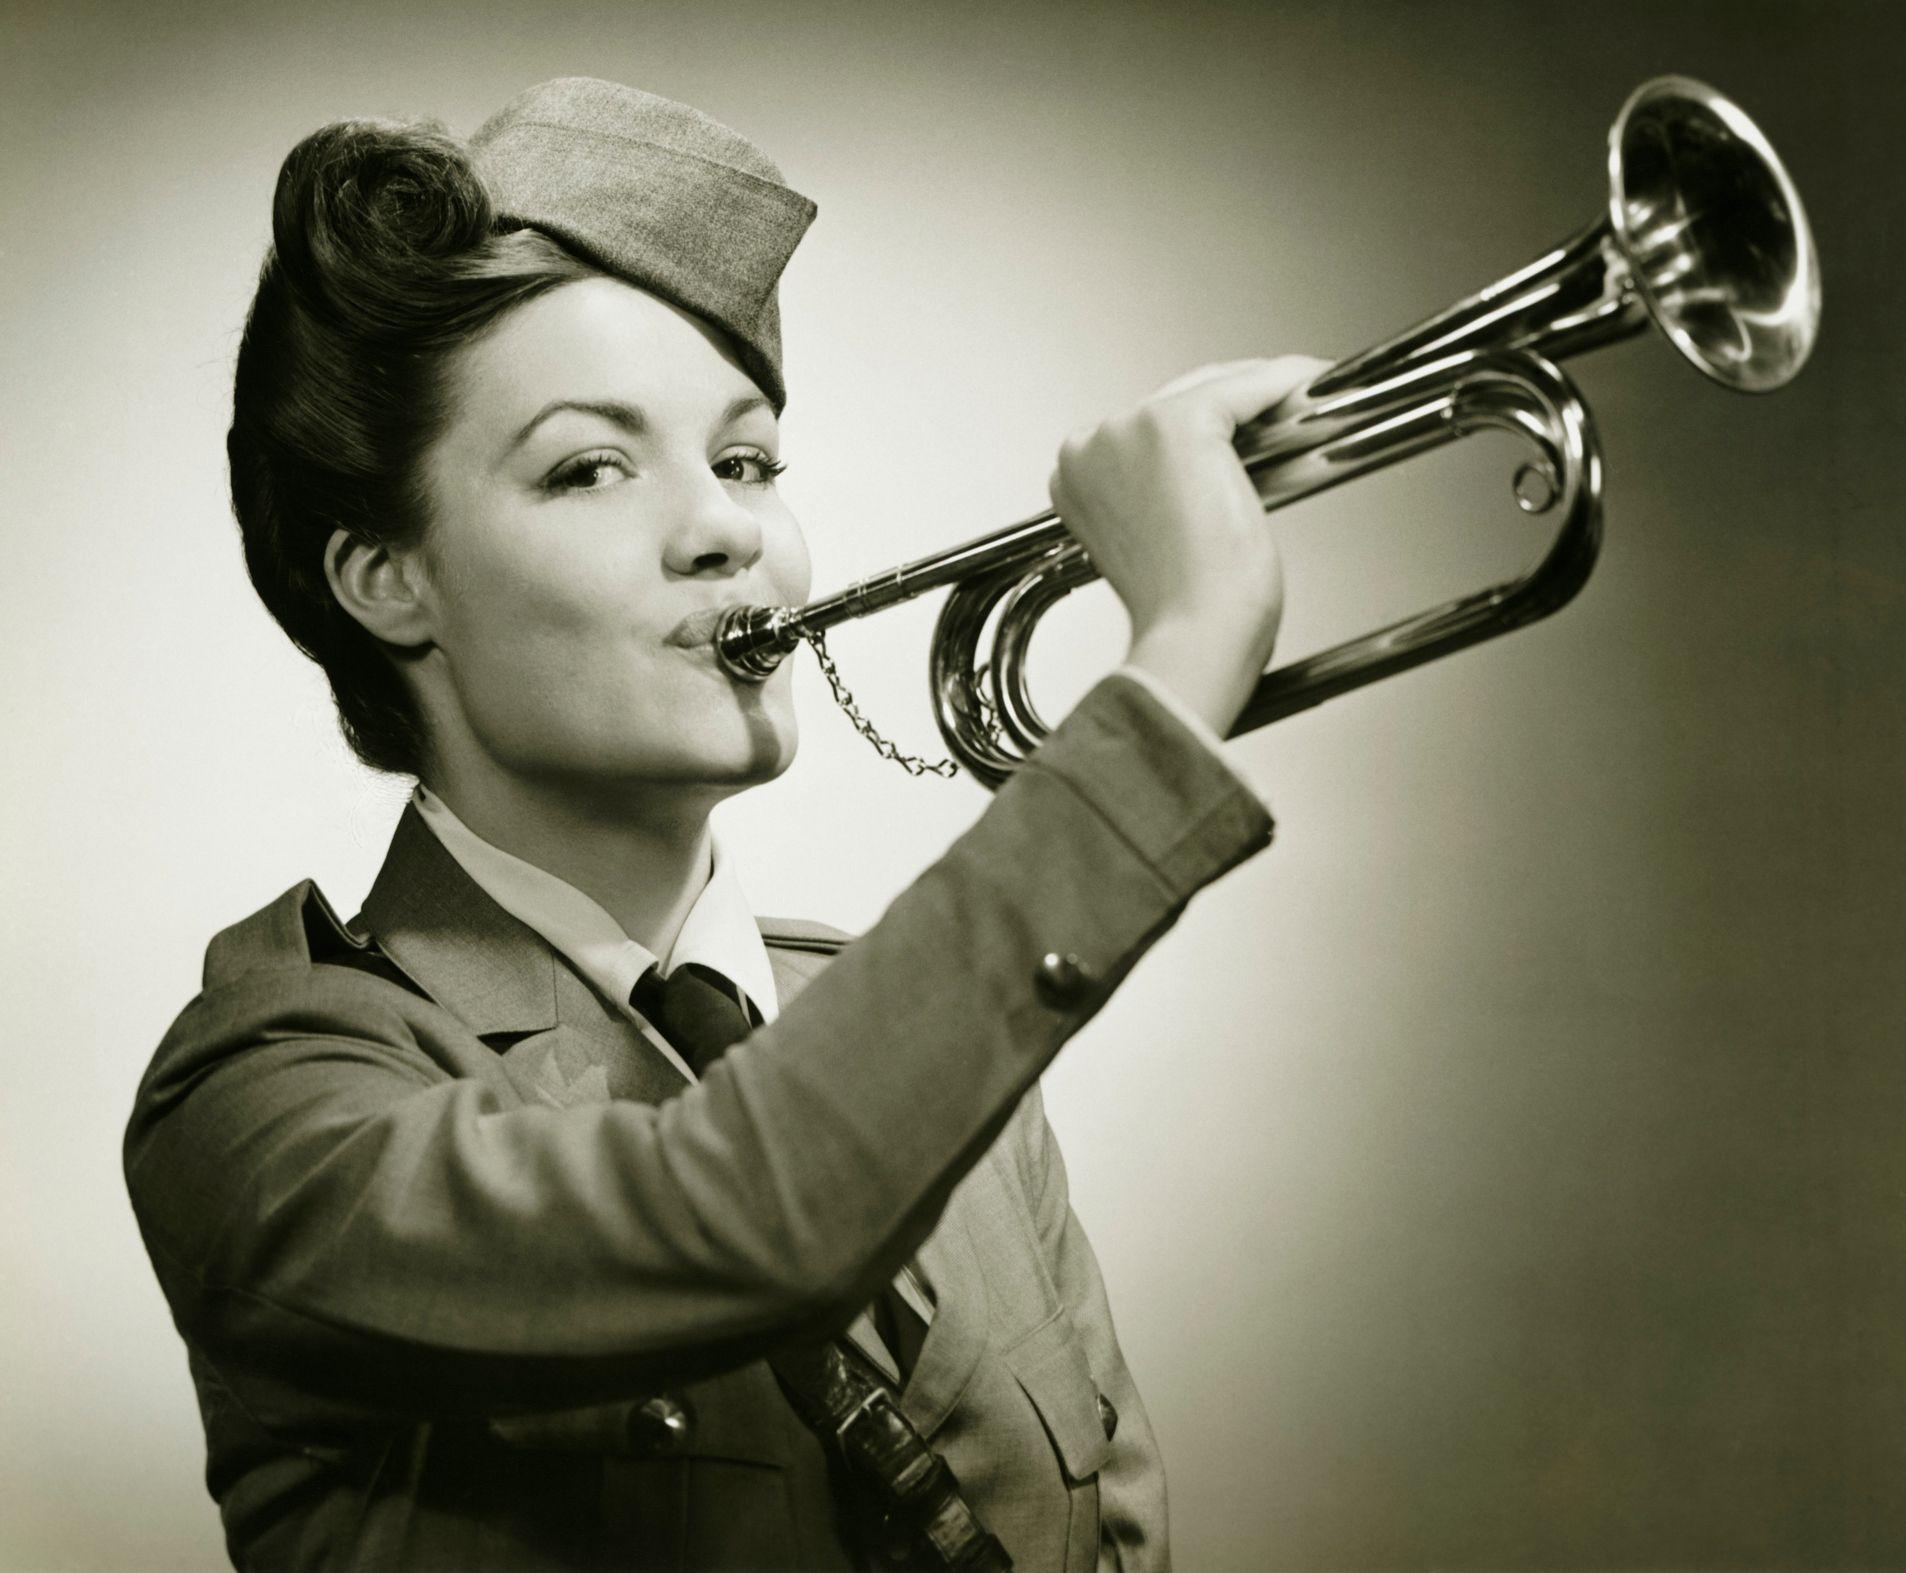 1489584314 rusty trombone rusty trombone secondo pornohub piace alle donne